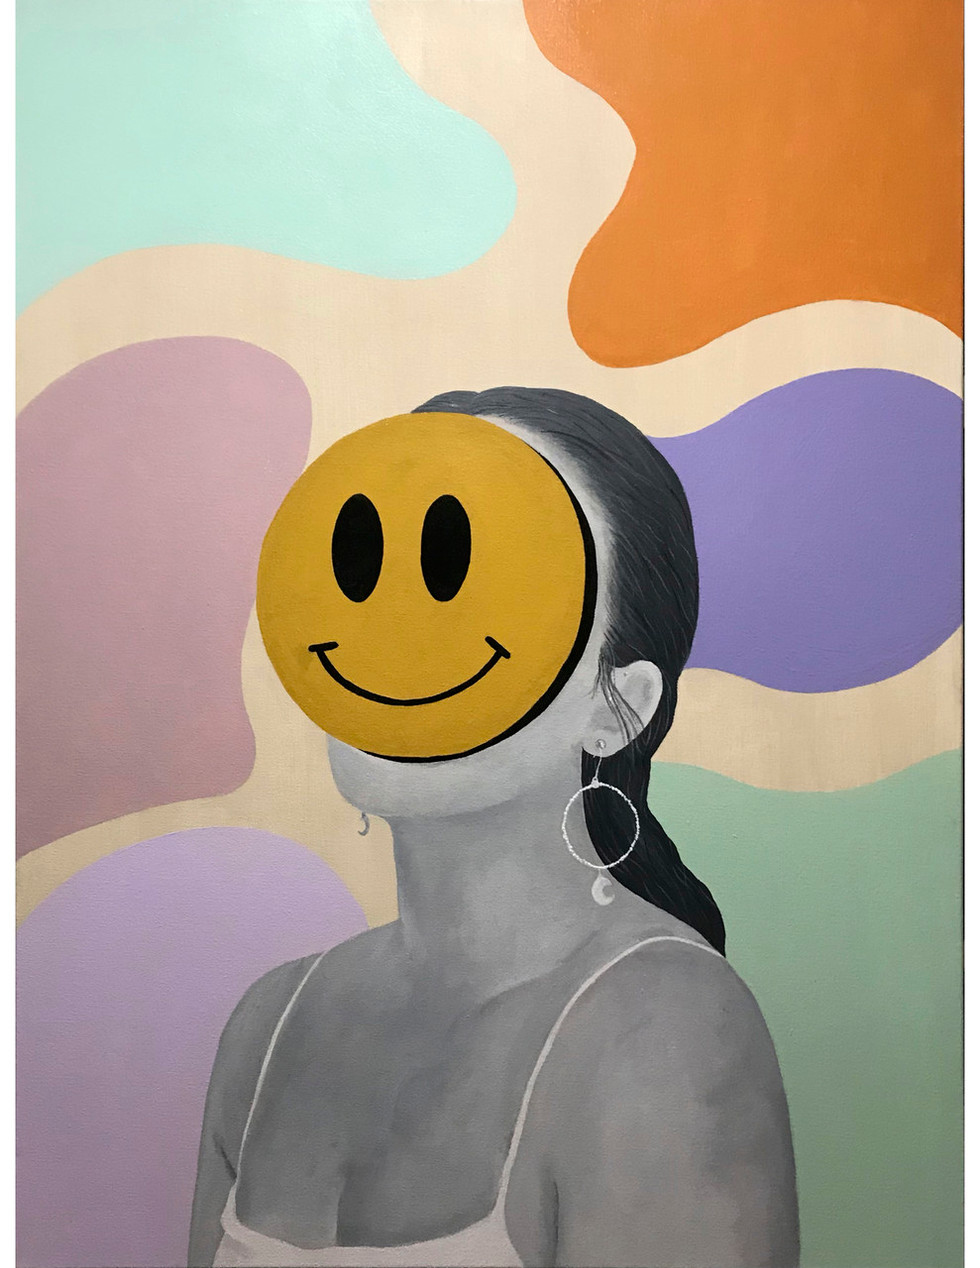 Anna Twitchell, Facade